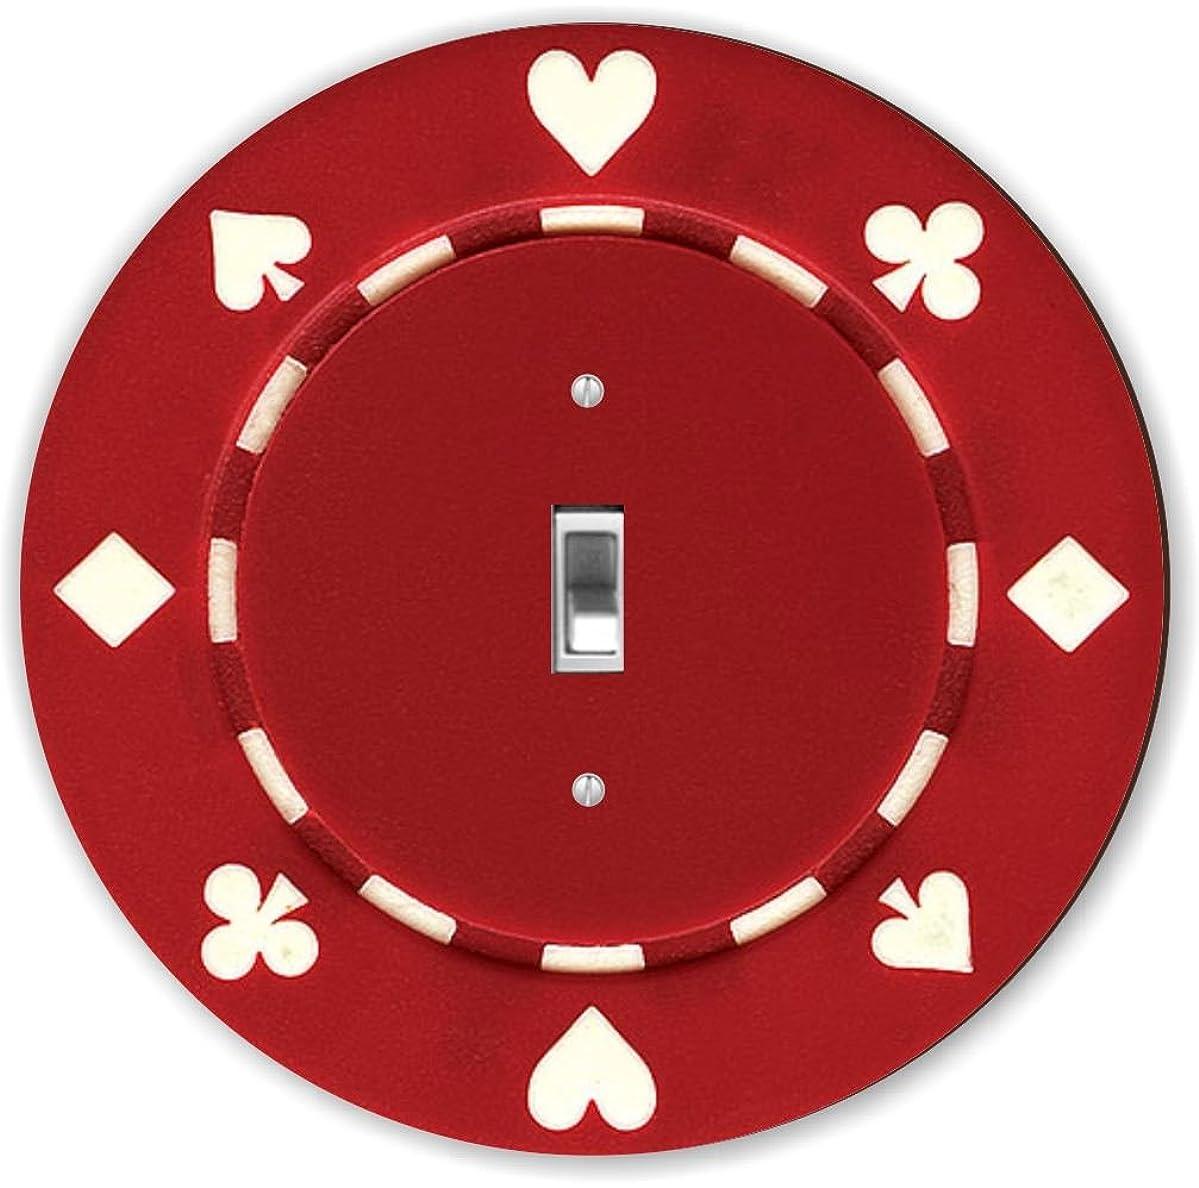 Rikki Knight RND-LSPS-83 Poker Chip Round - Single Toggle Light Switch Plate, Red